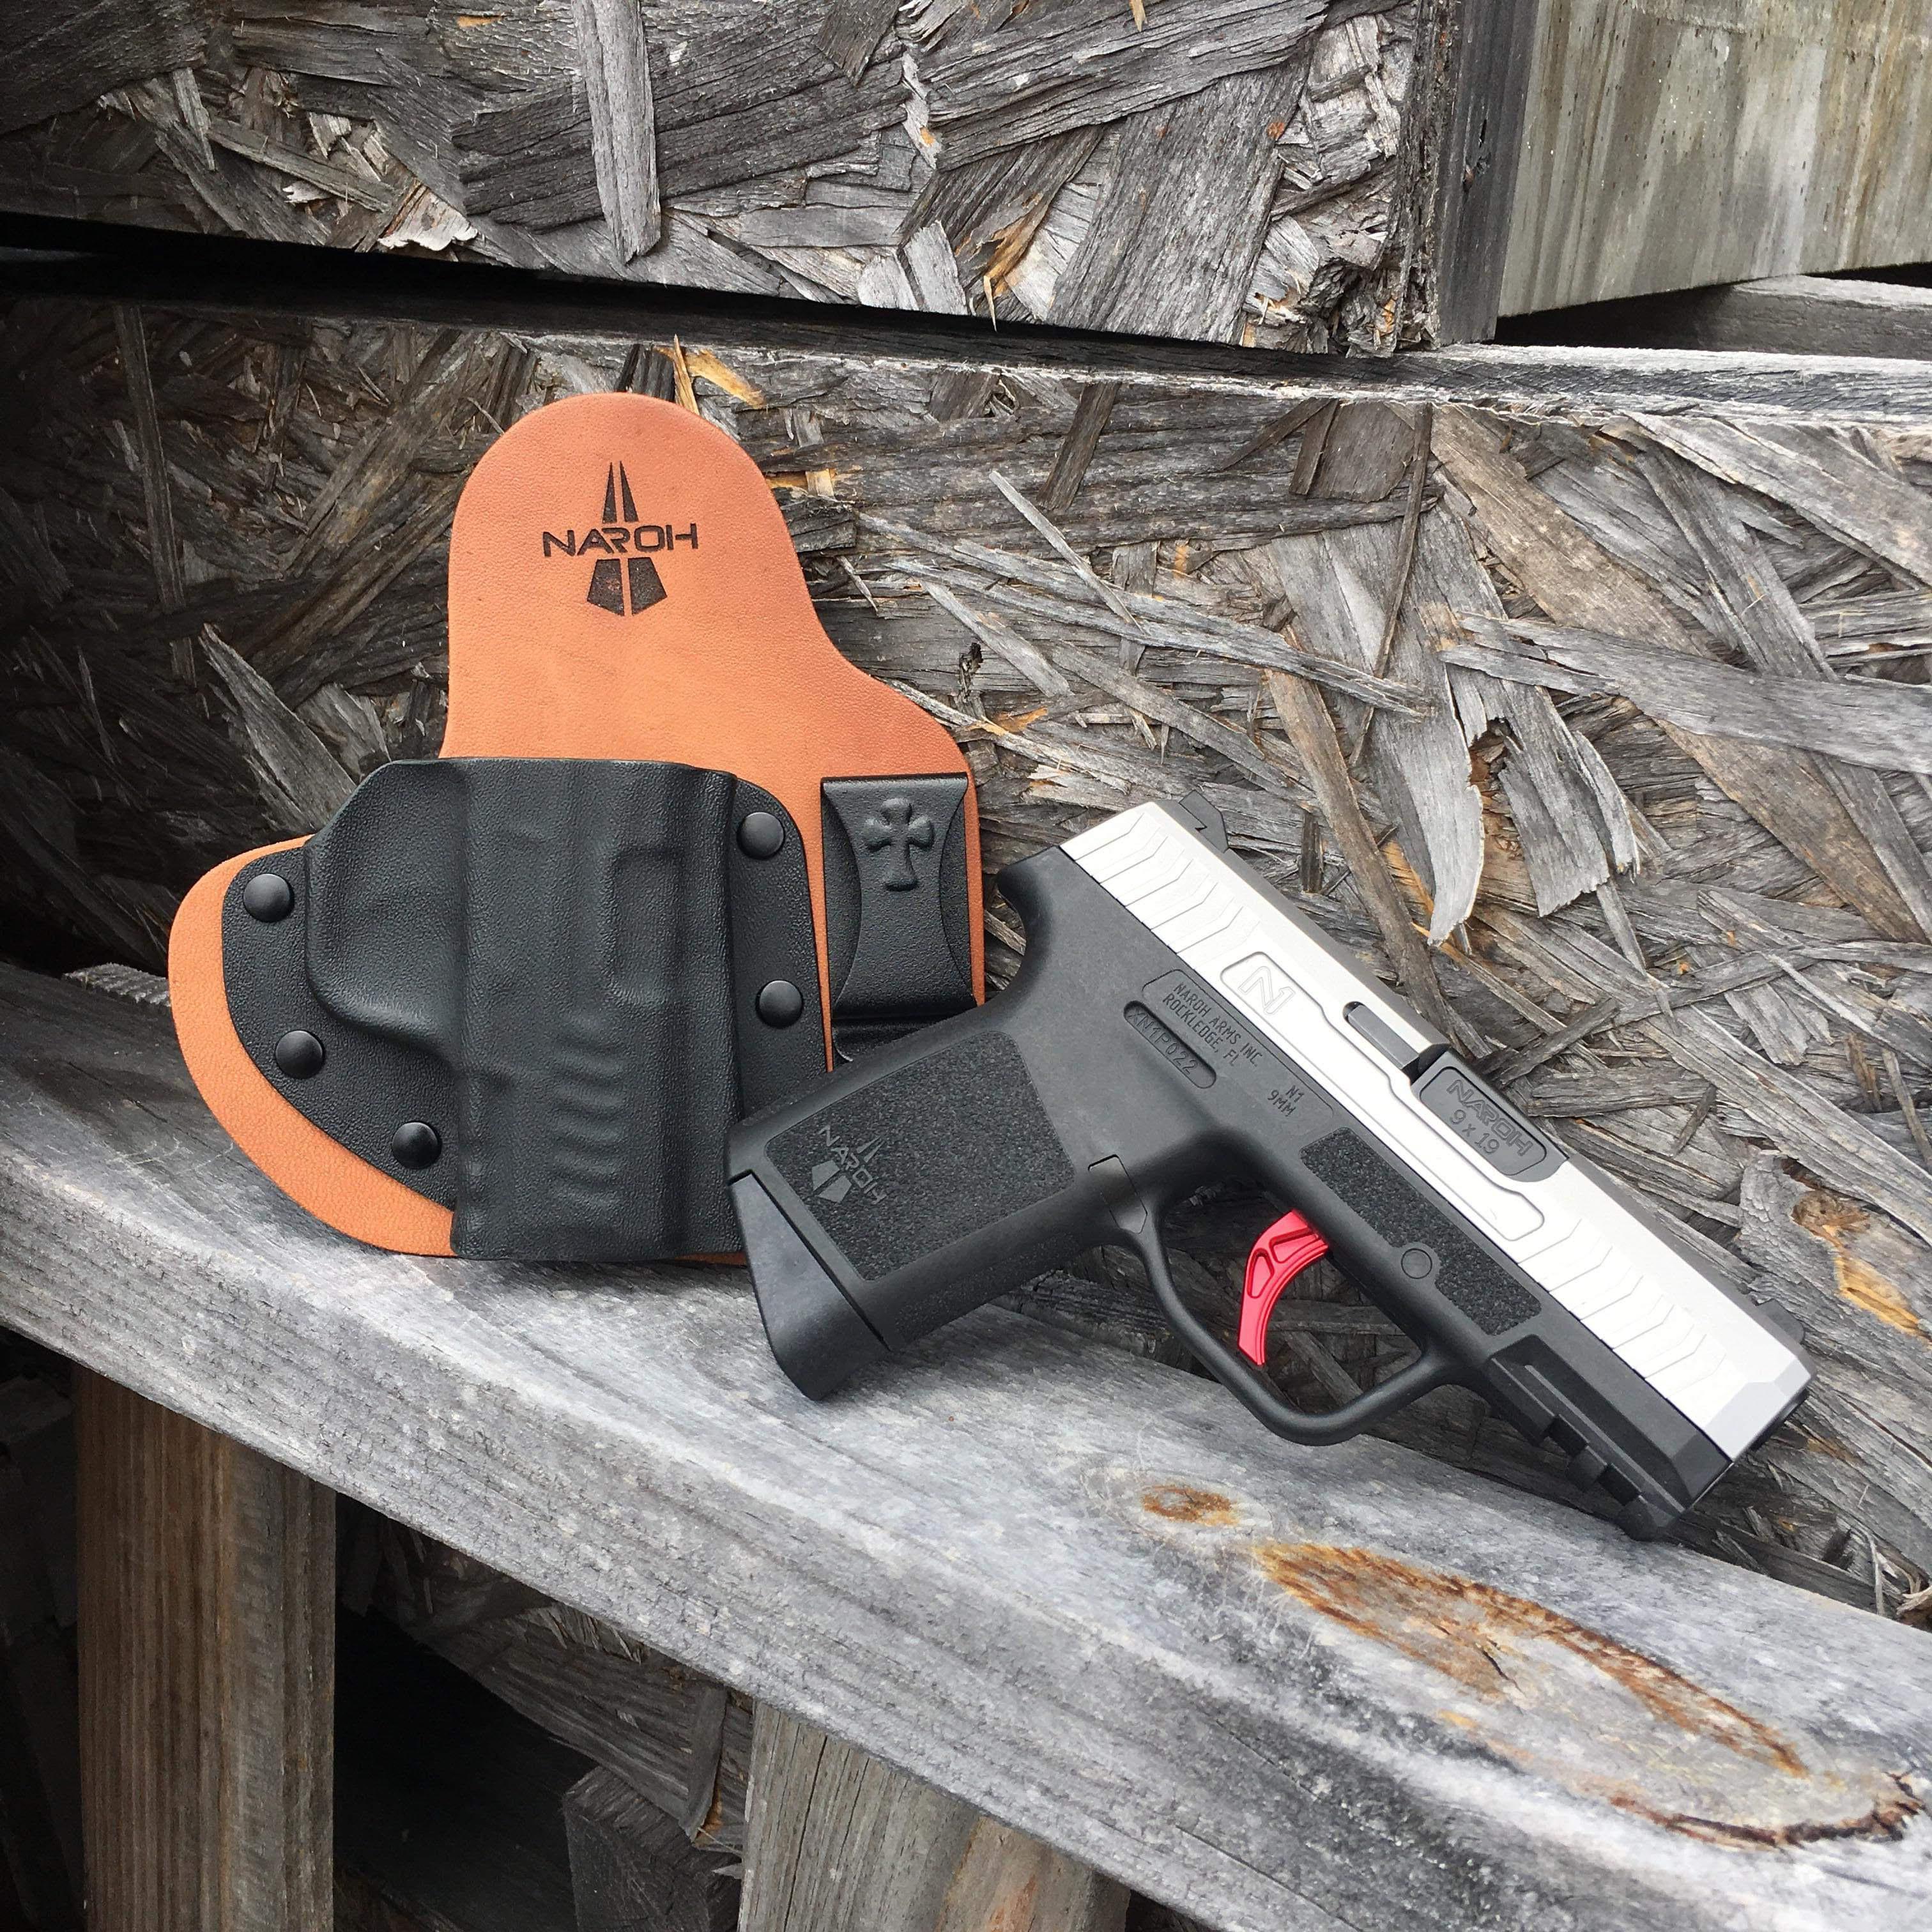 Crossbreed N1 Pistol